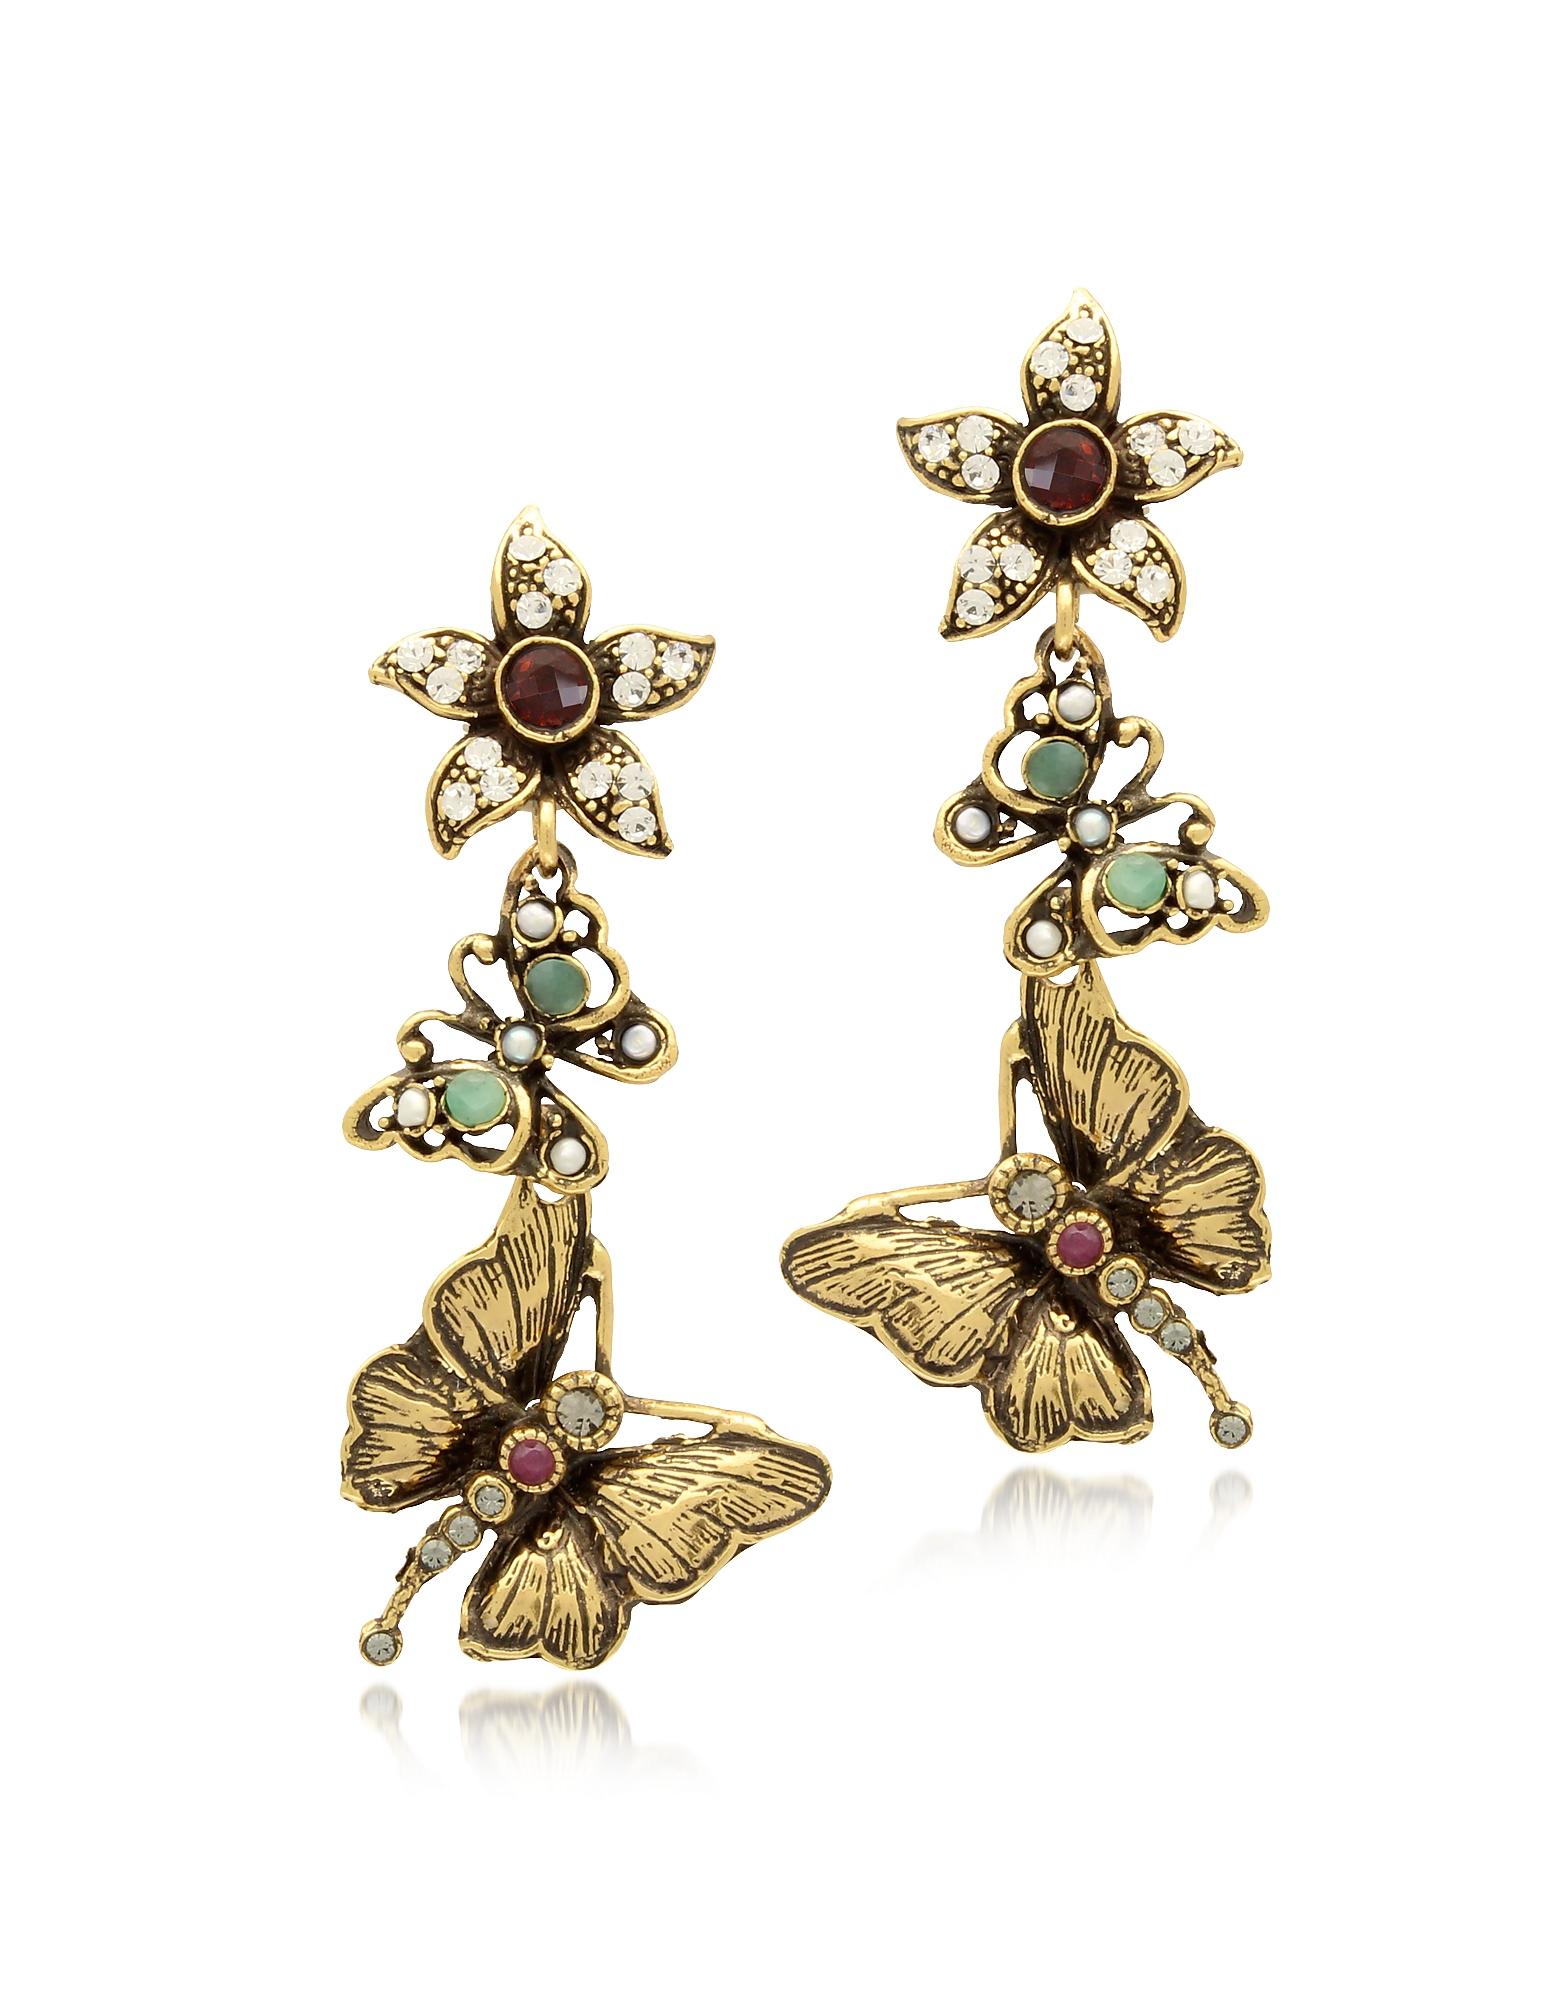 Forzieri coupon: Alcozer & J  Earrings Gemstone Gold Plated Brass Butterflies with Flower Earrings